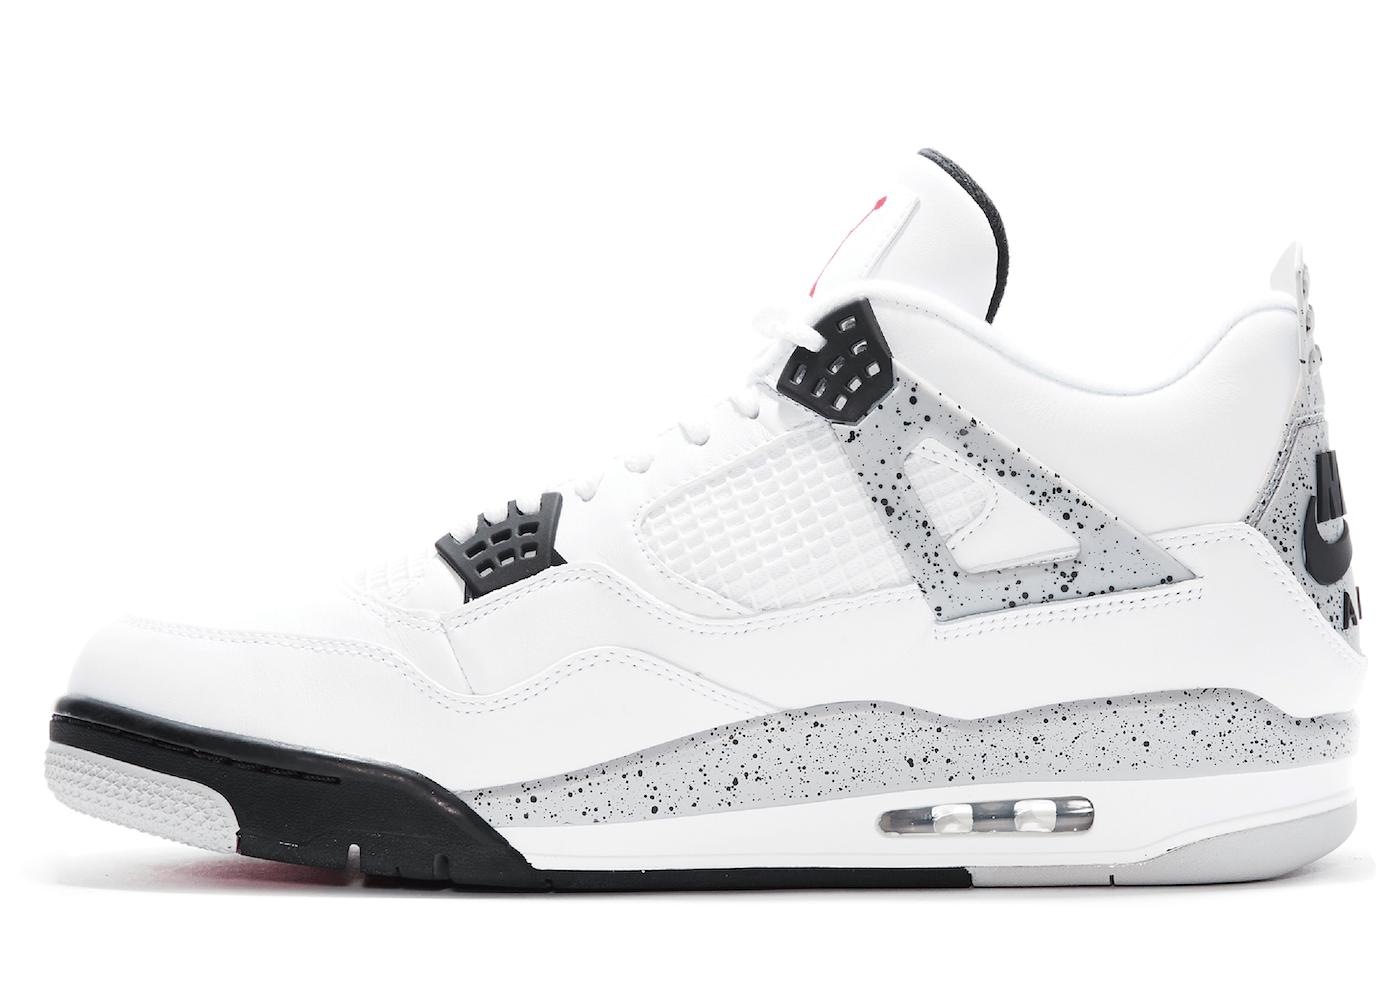 Nike Air Jordan 4 Retro White Cement (2016)の写真